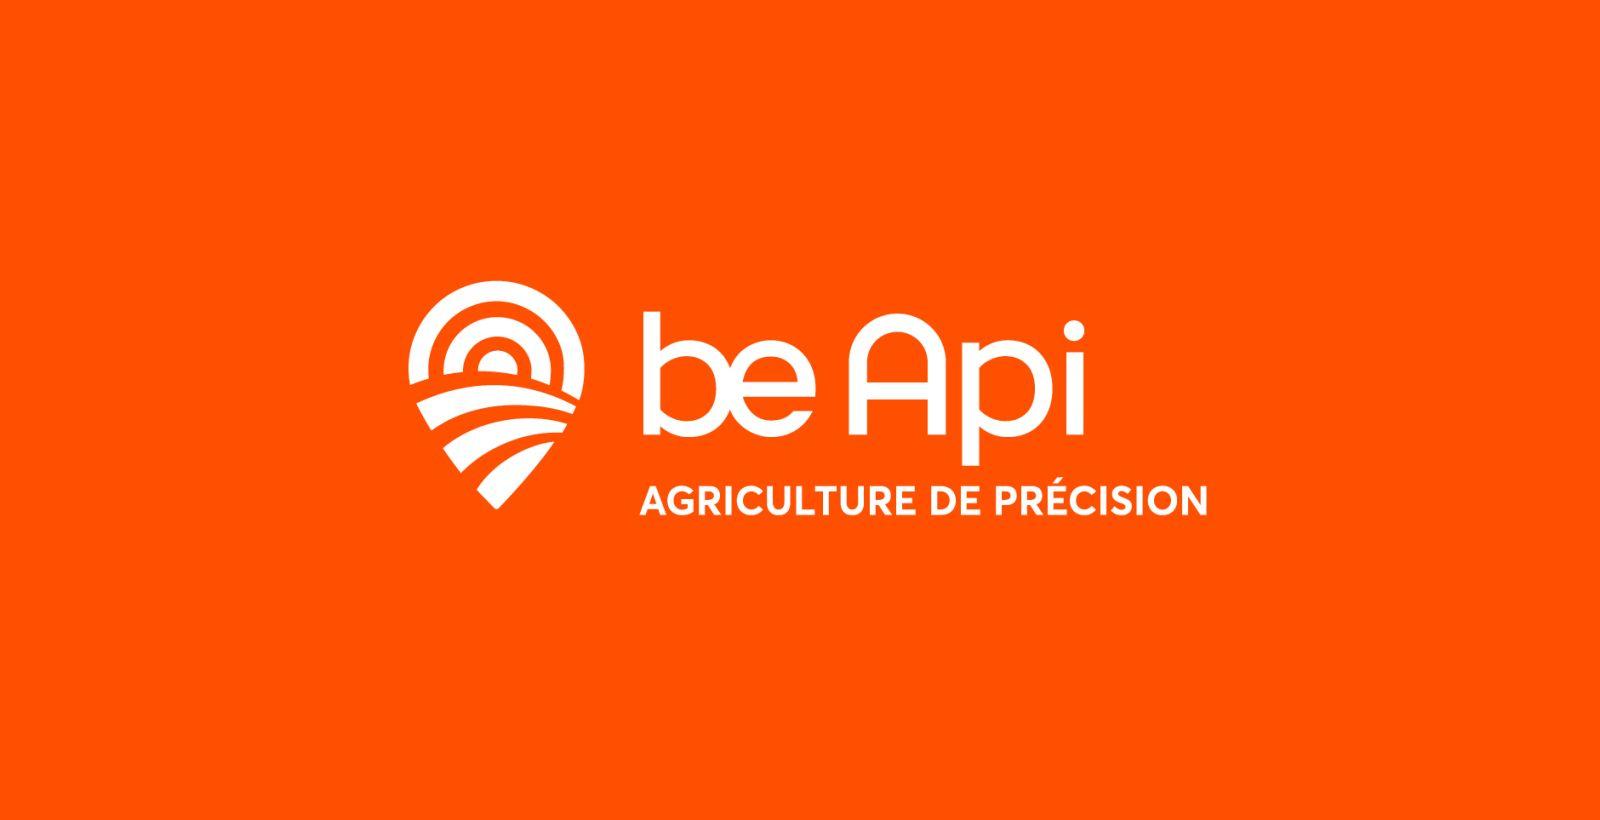 creative branding design of be api